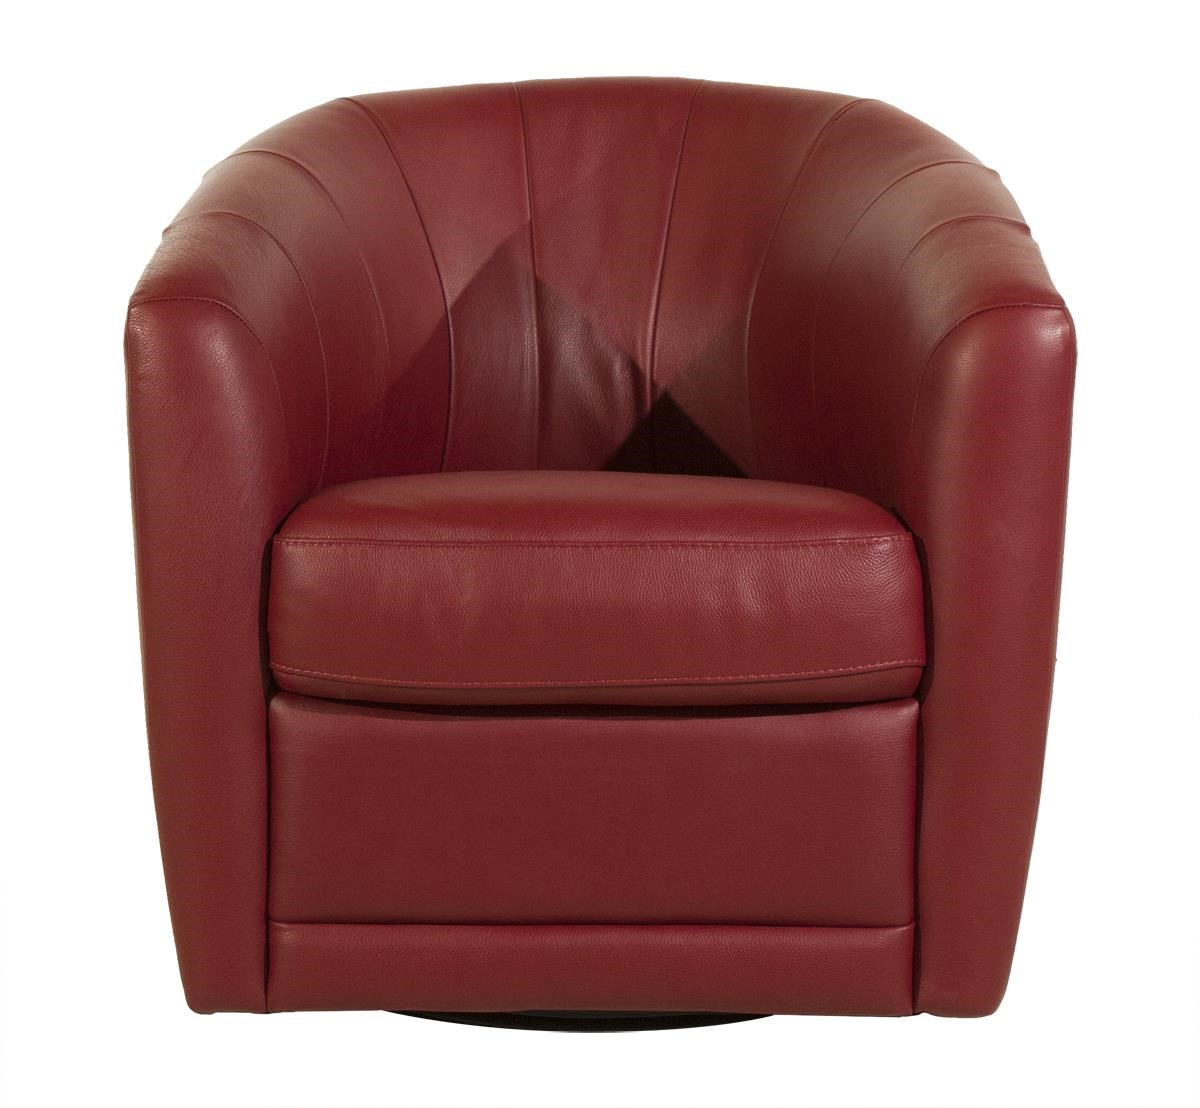 Giada Swivel Chair by Natuzzi Editions at HomeWorld Furniture